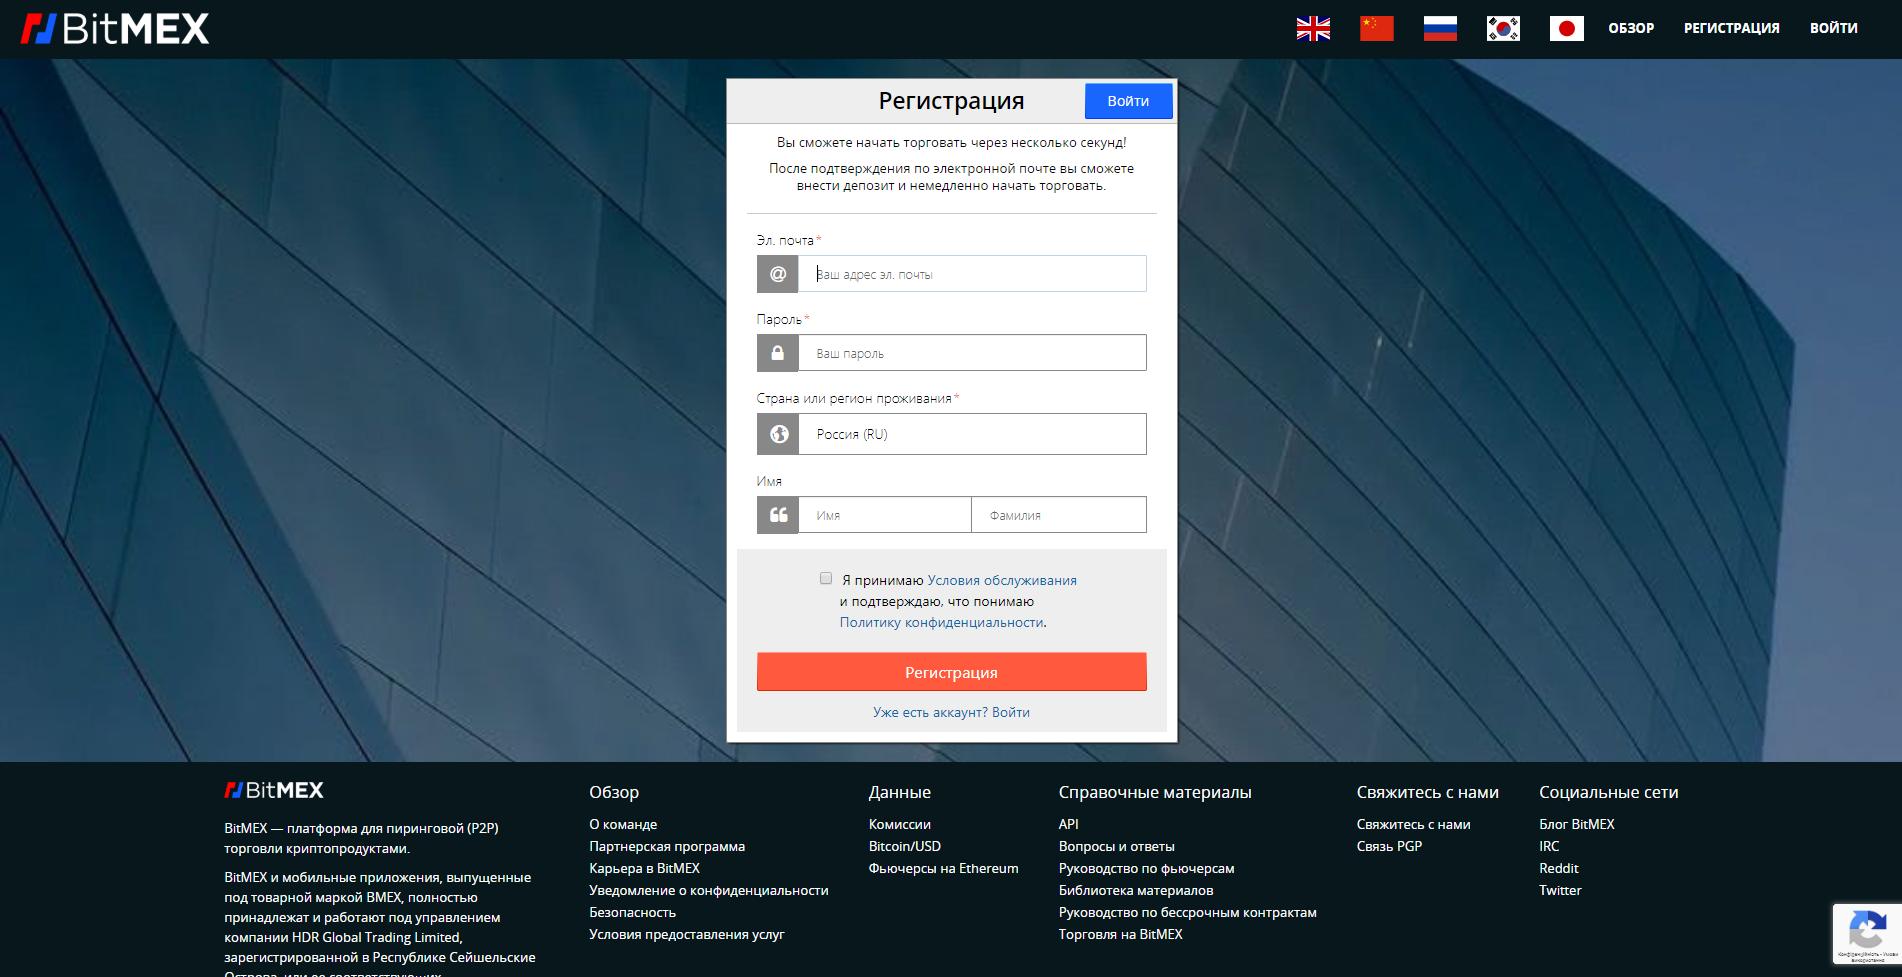 Биржа BitMEX — обзор, регистрация, пополнение счета и вывод